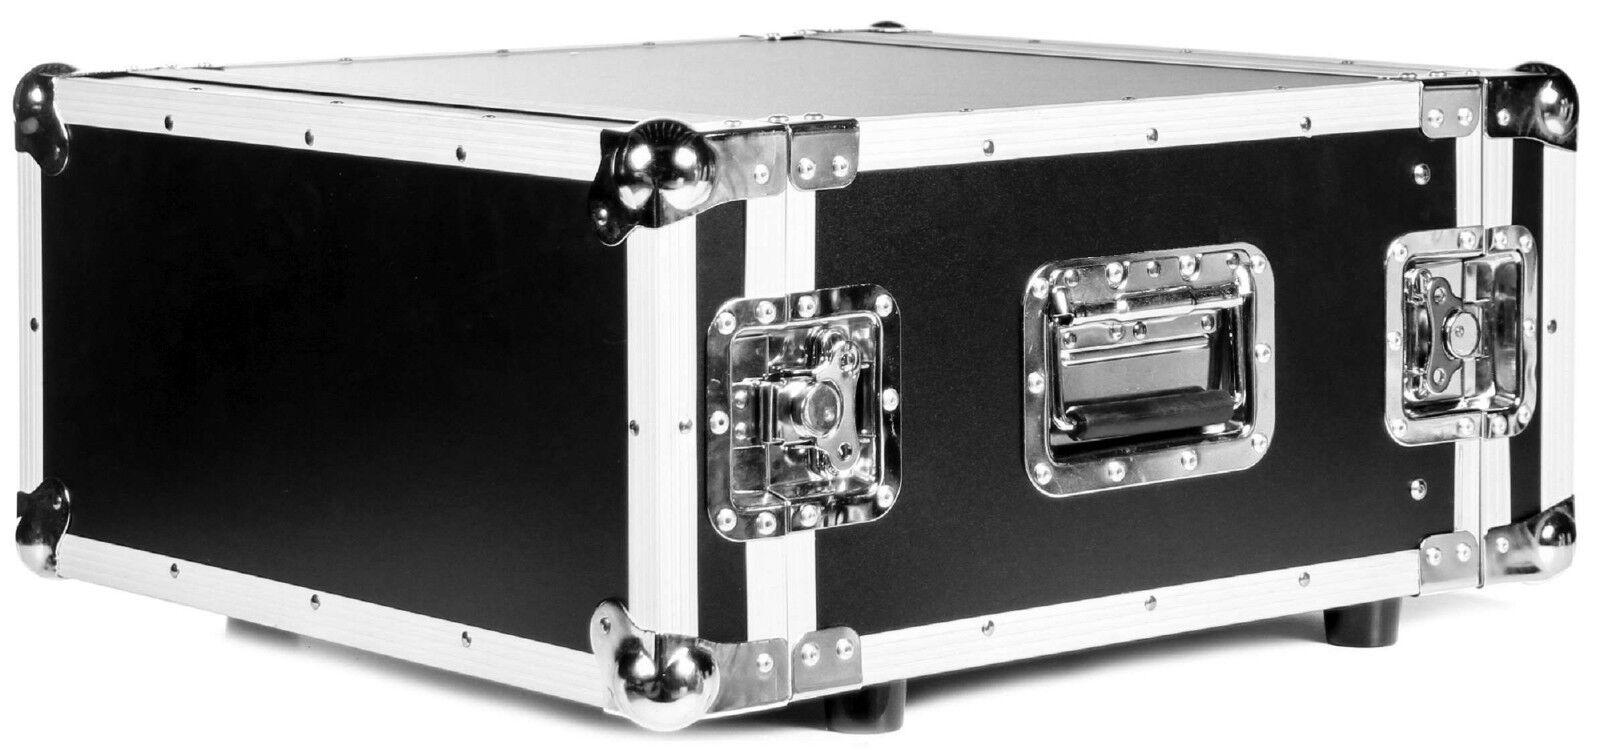 TEGO PRO 5 HE Rack Effektrack 43 cm tief 19  CO DD schwarz, Amprack DJ-Rack Case